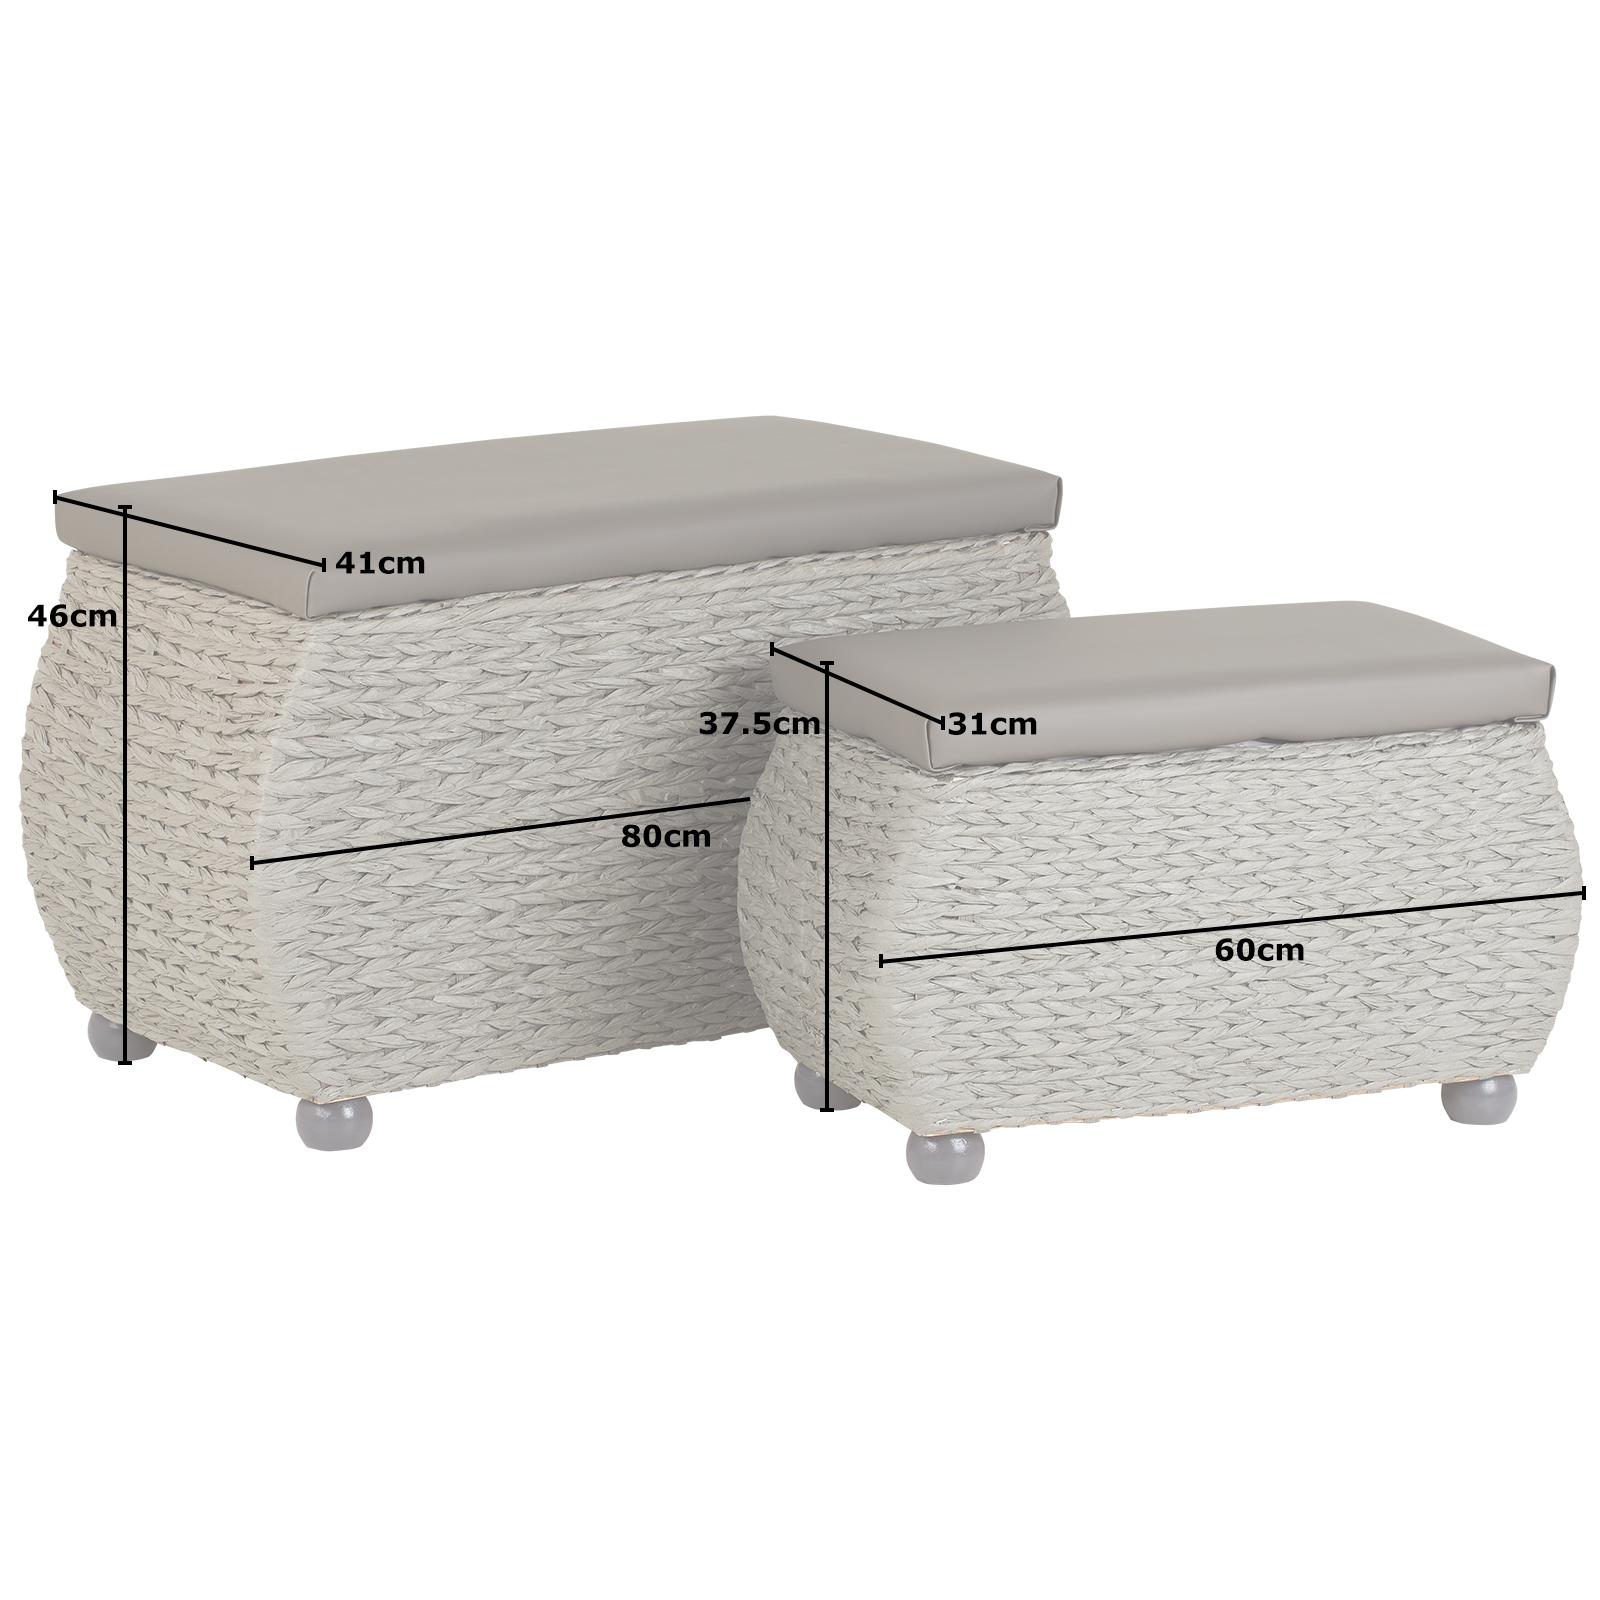 Terrific Details About Hartleys Twin Storage Trunk Stool Bedding Blanket Rattan Wicker Box Bench Seat Uwap Interior Chair Design Uwaporg